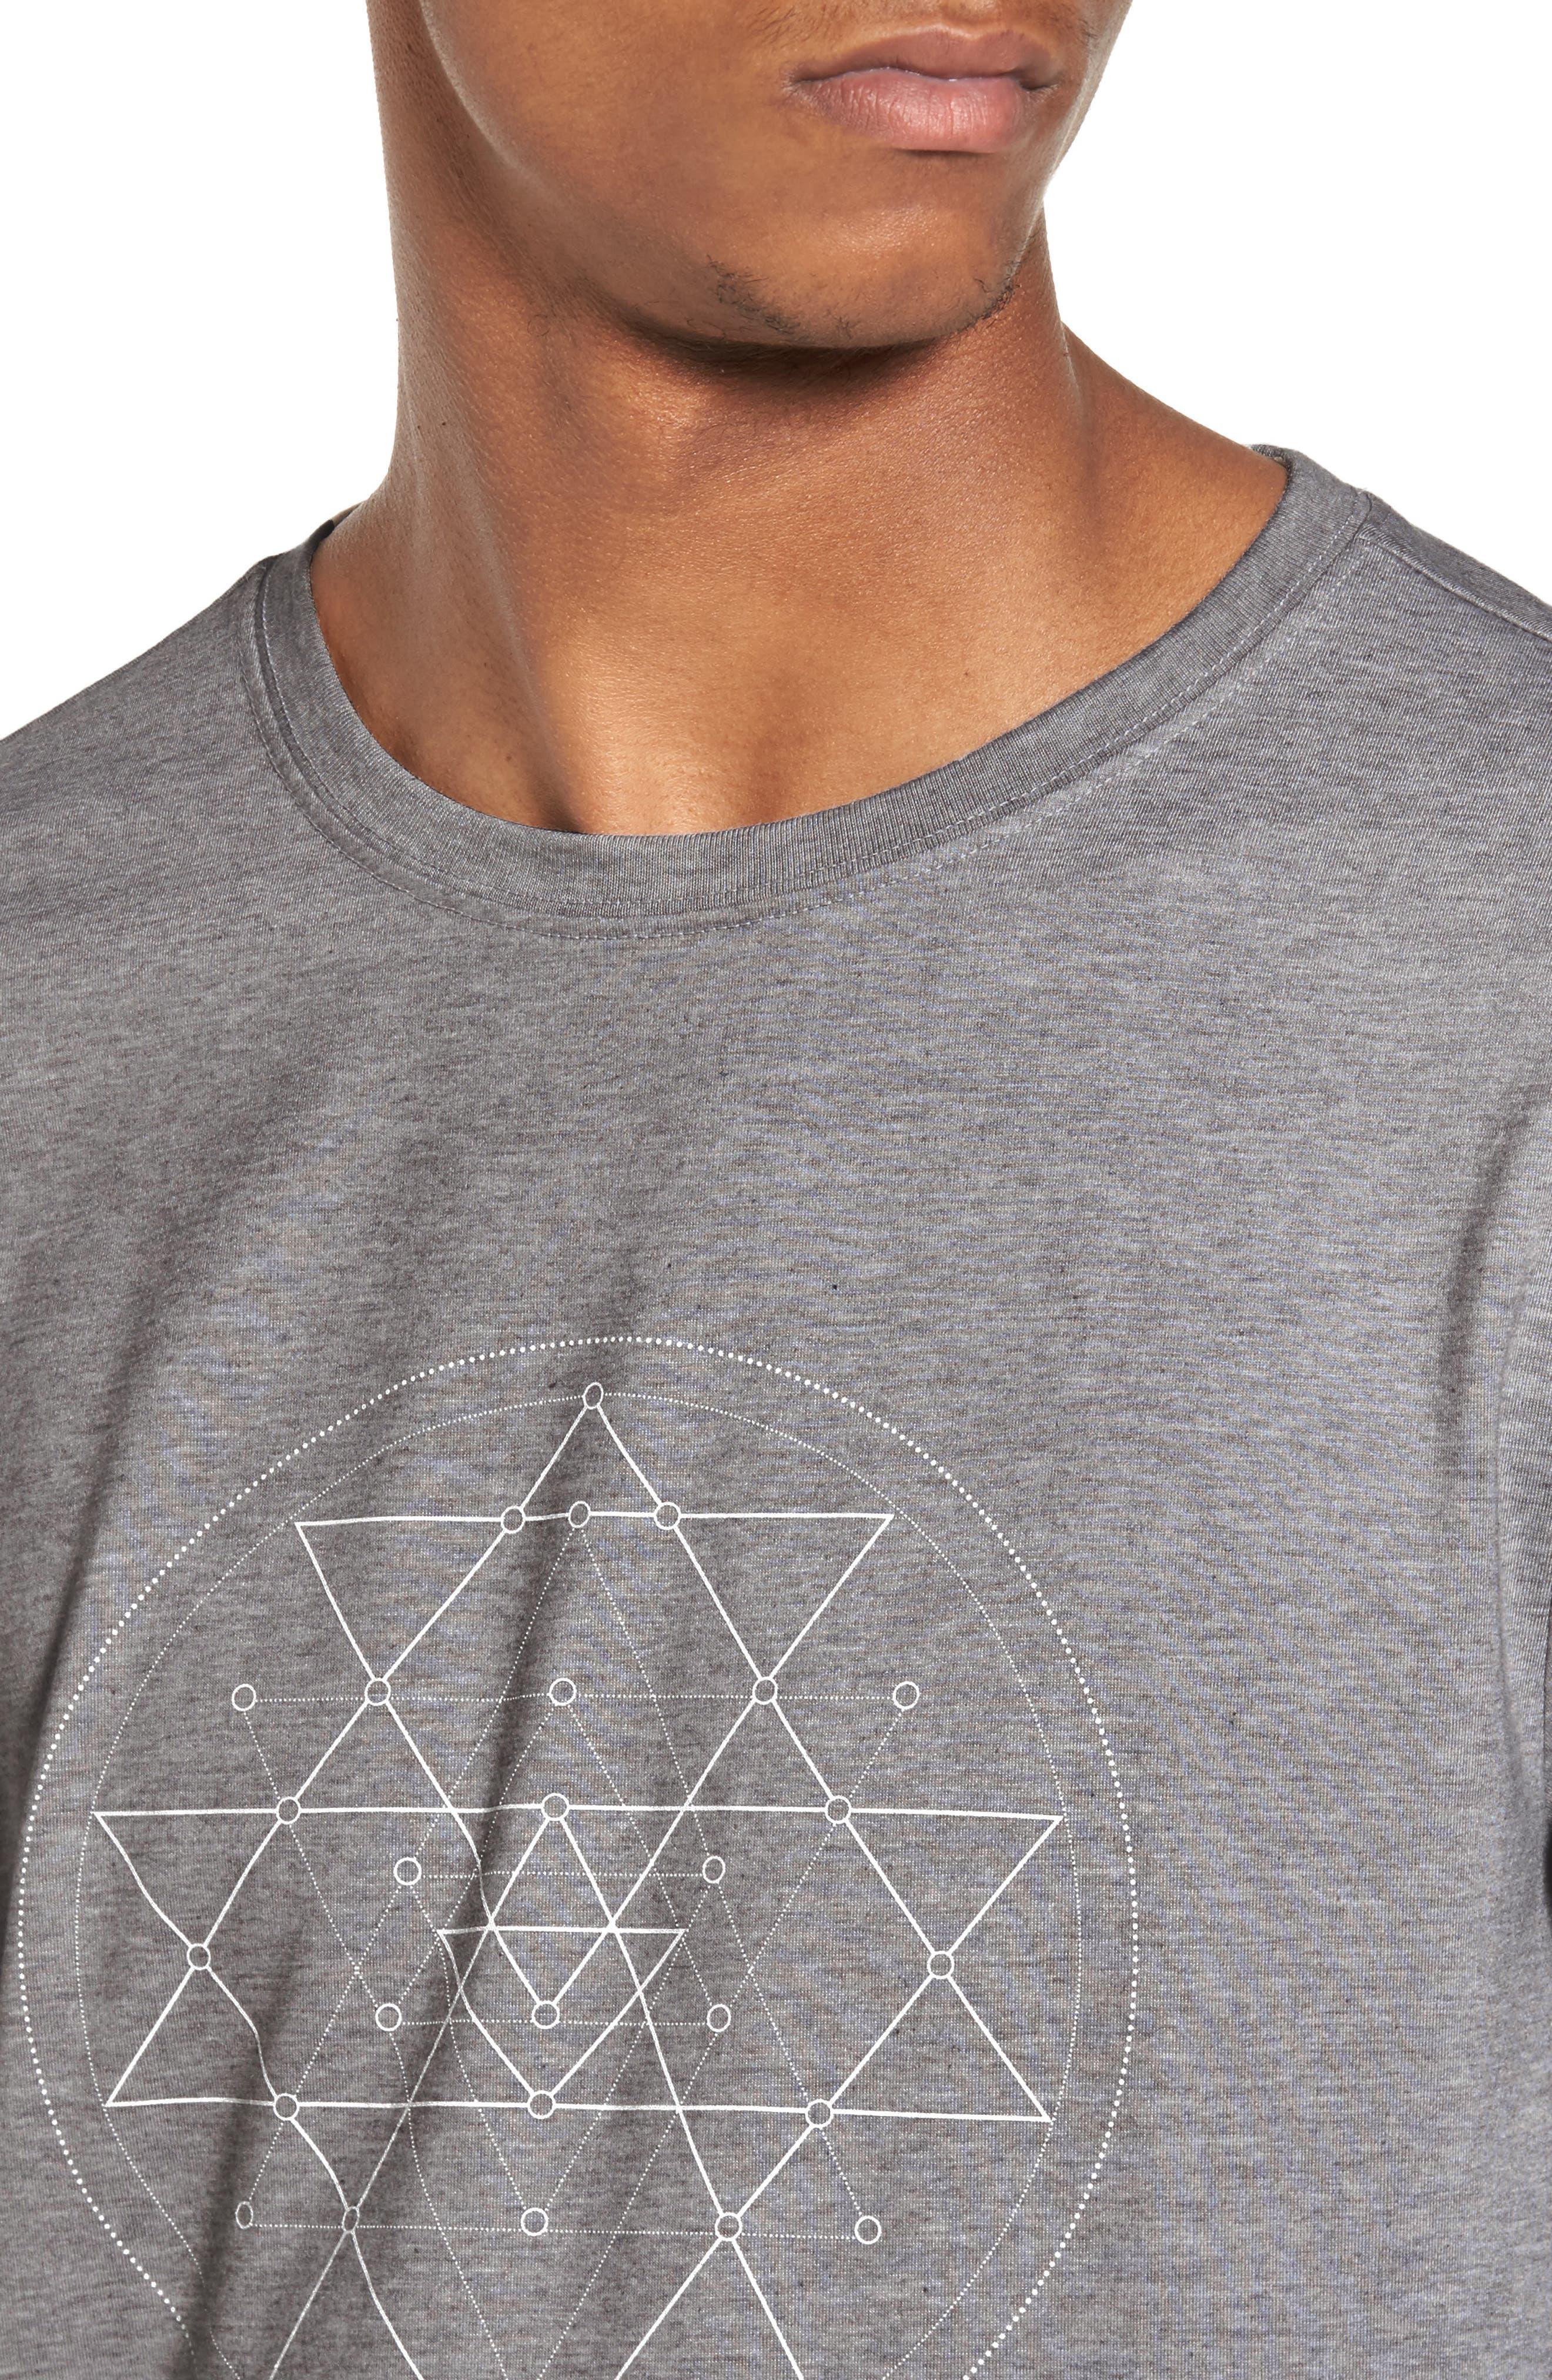 Yantra Long Sleeve T-Shirt,                             Alternate thumbnail 8, color,                             Heather Grey/ Heather Grey